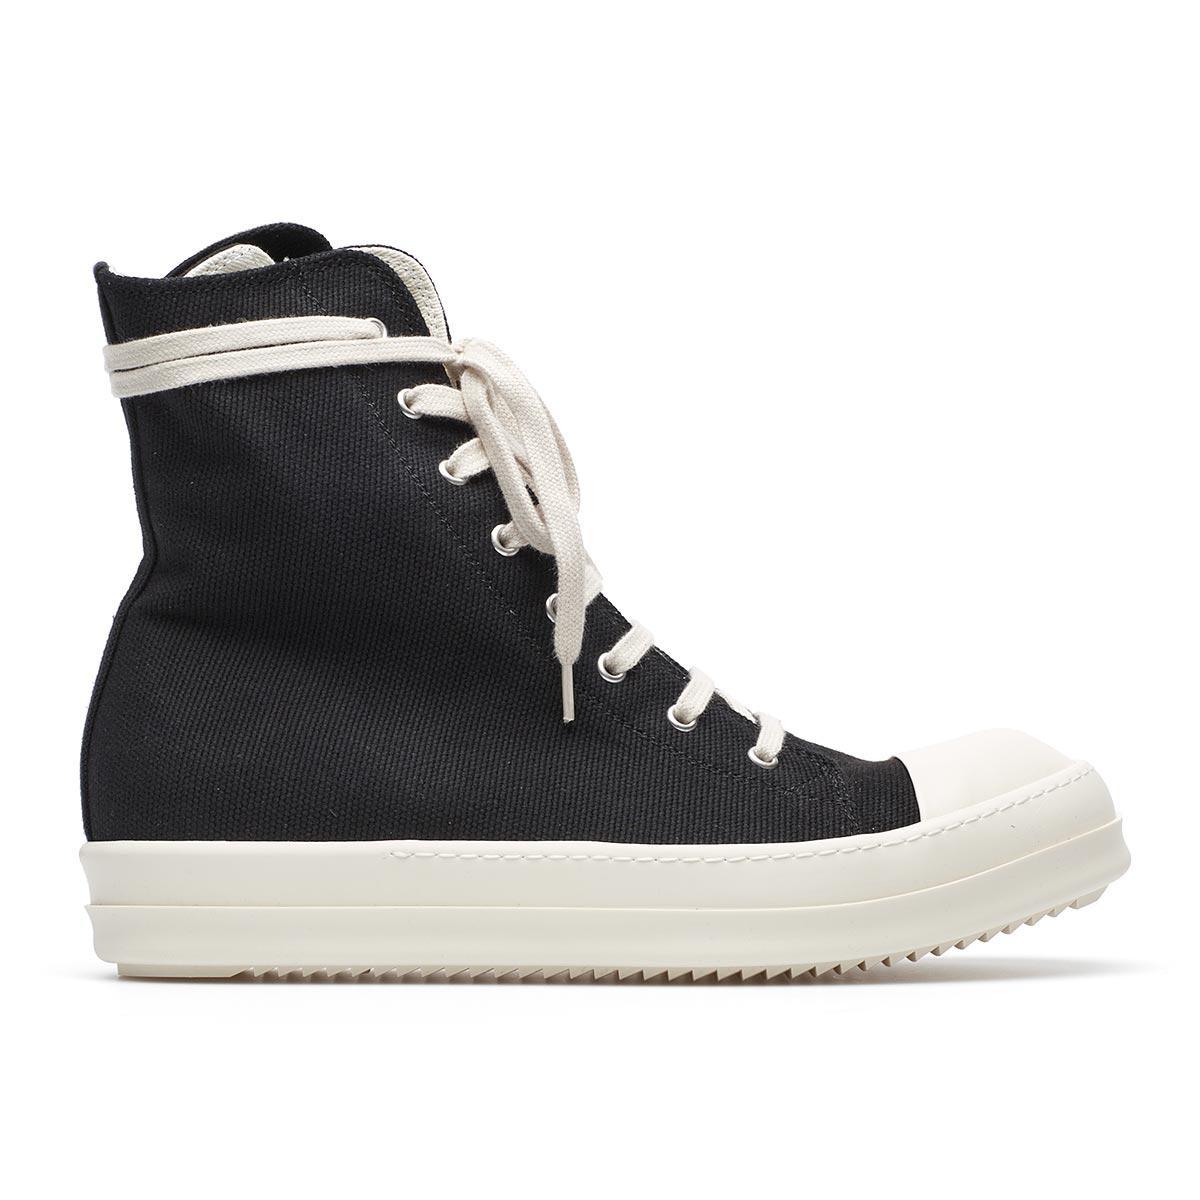 lyst rick owens drkshdw canvas high top sneakers in black for men. Black Bedroom Furniture Sets. Home Design Ideas